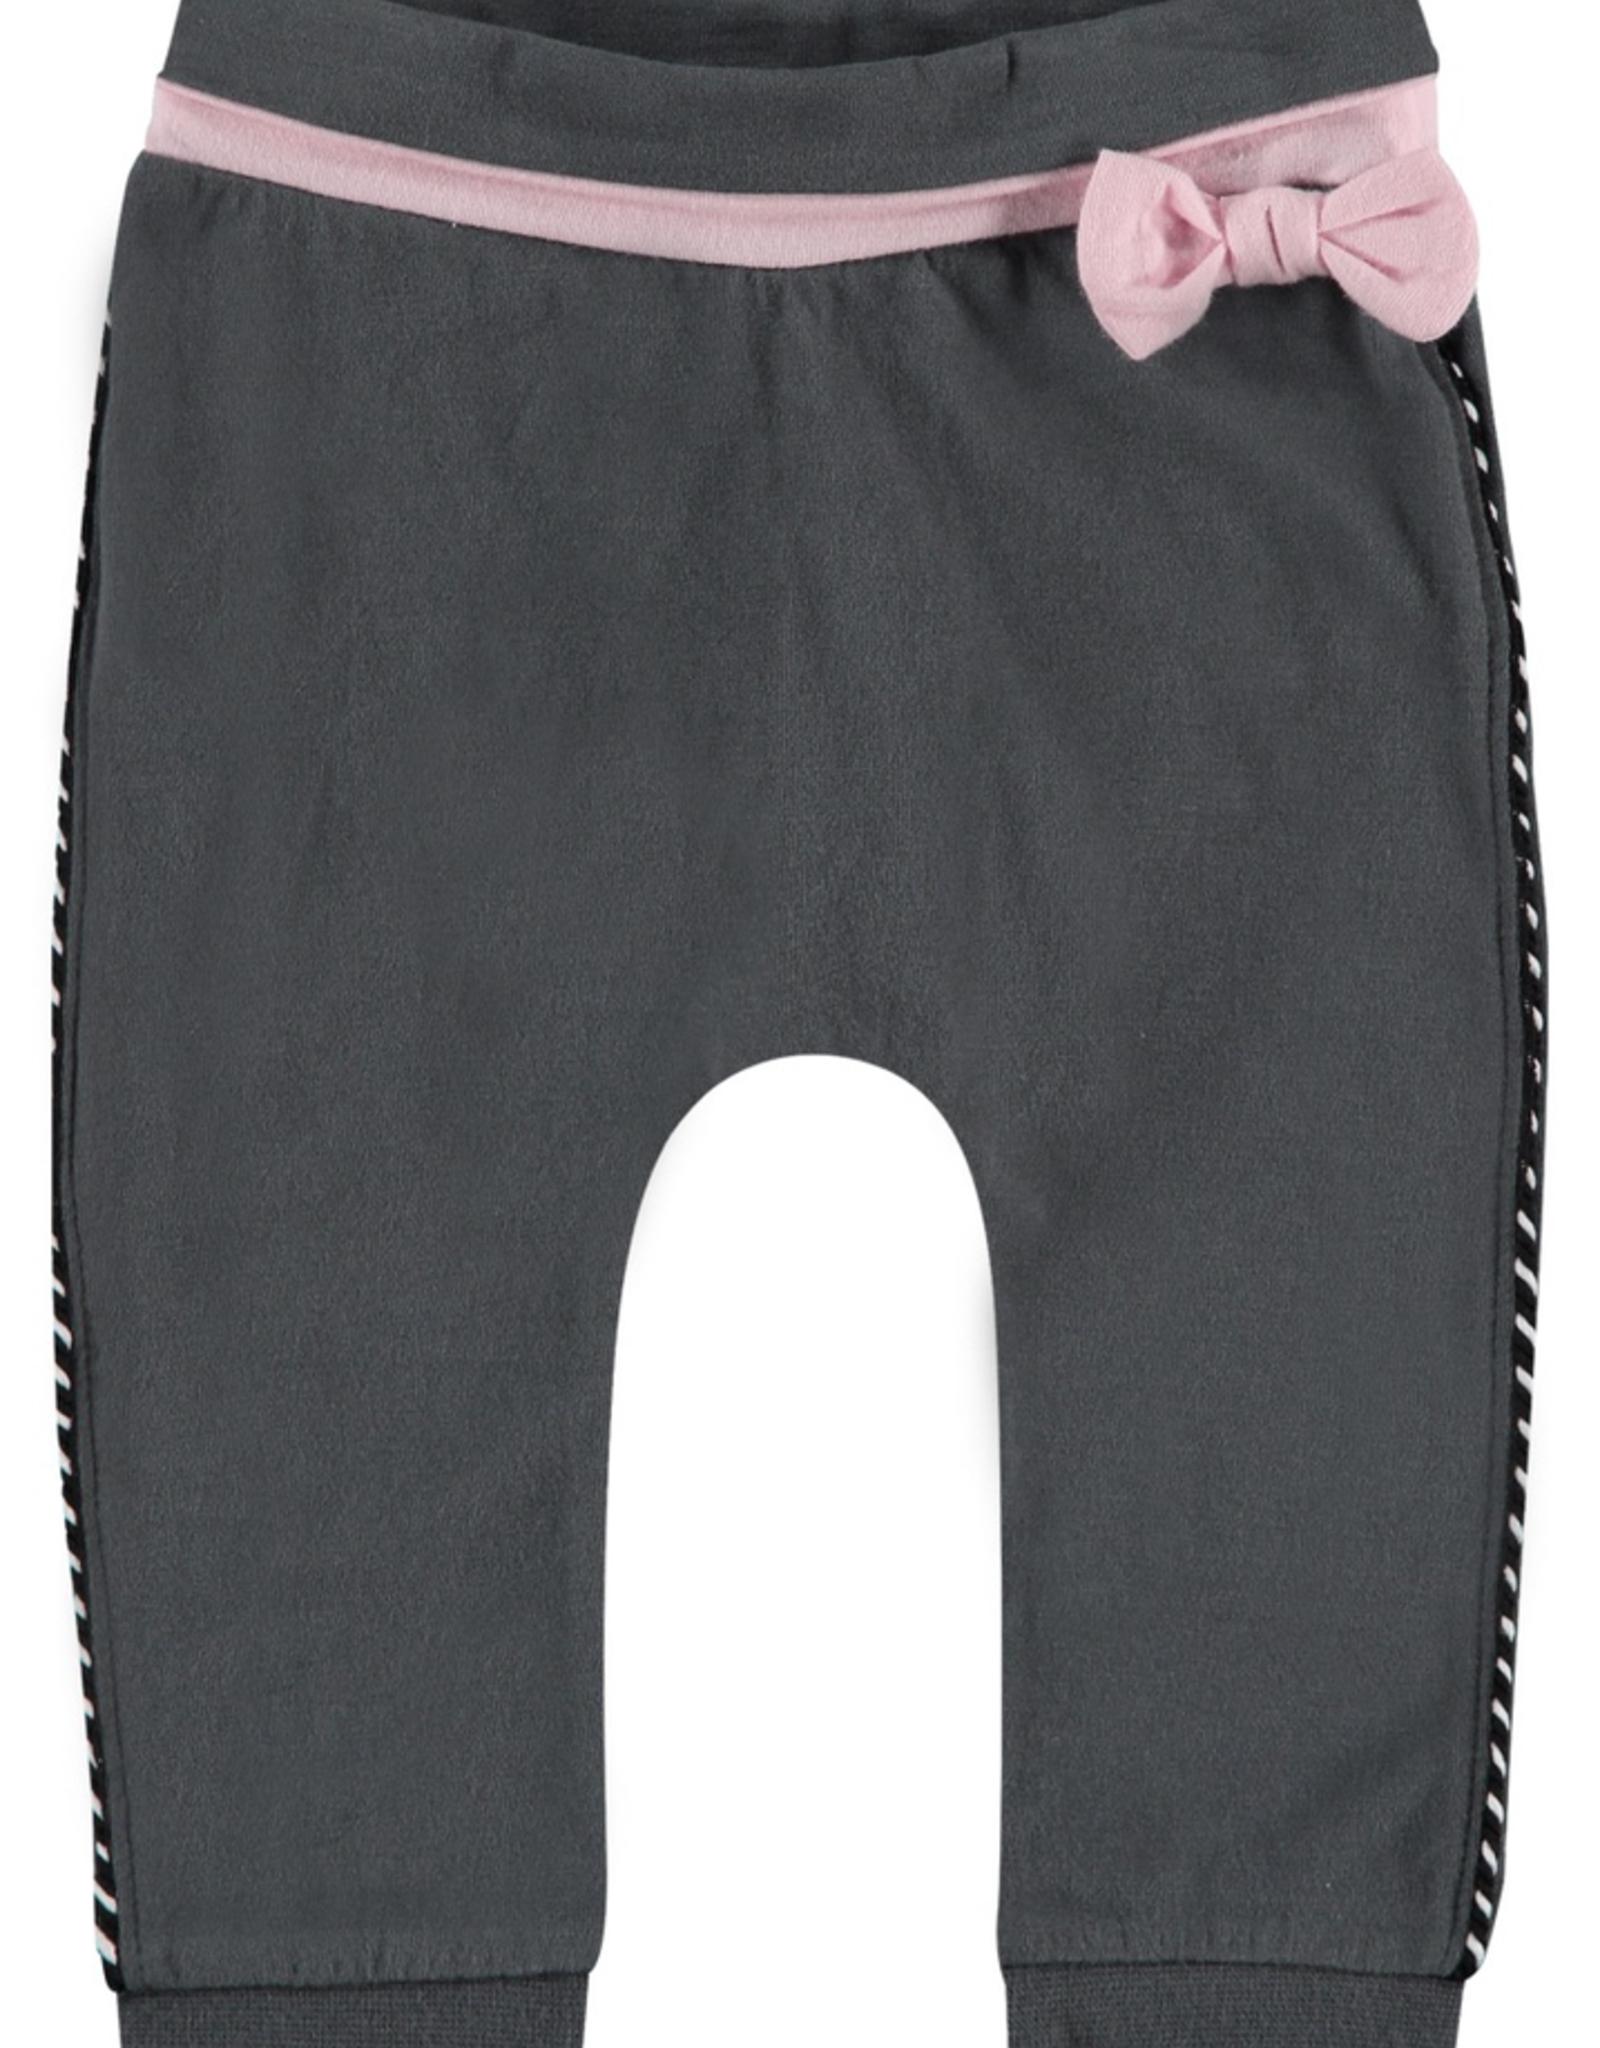 Noppies Kids Kusel Slim Jersey Pants for Baby Girl